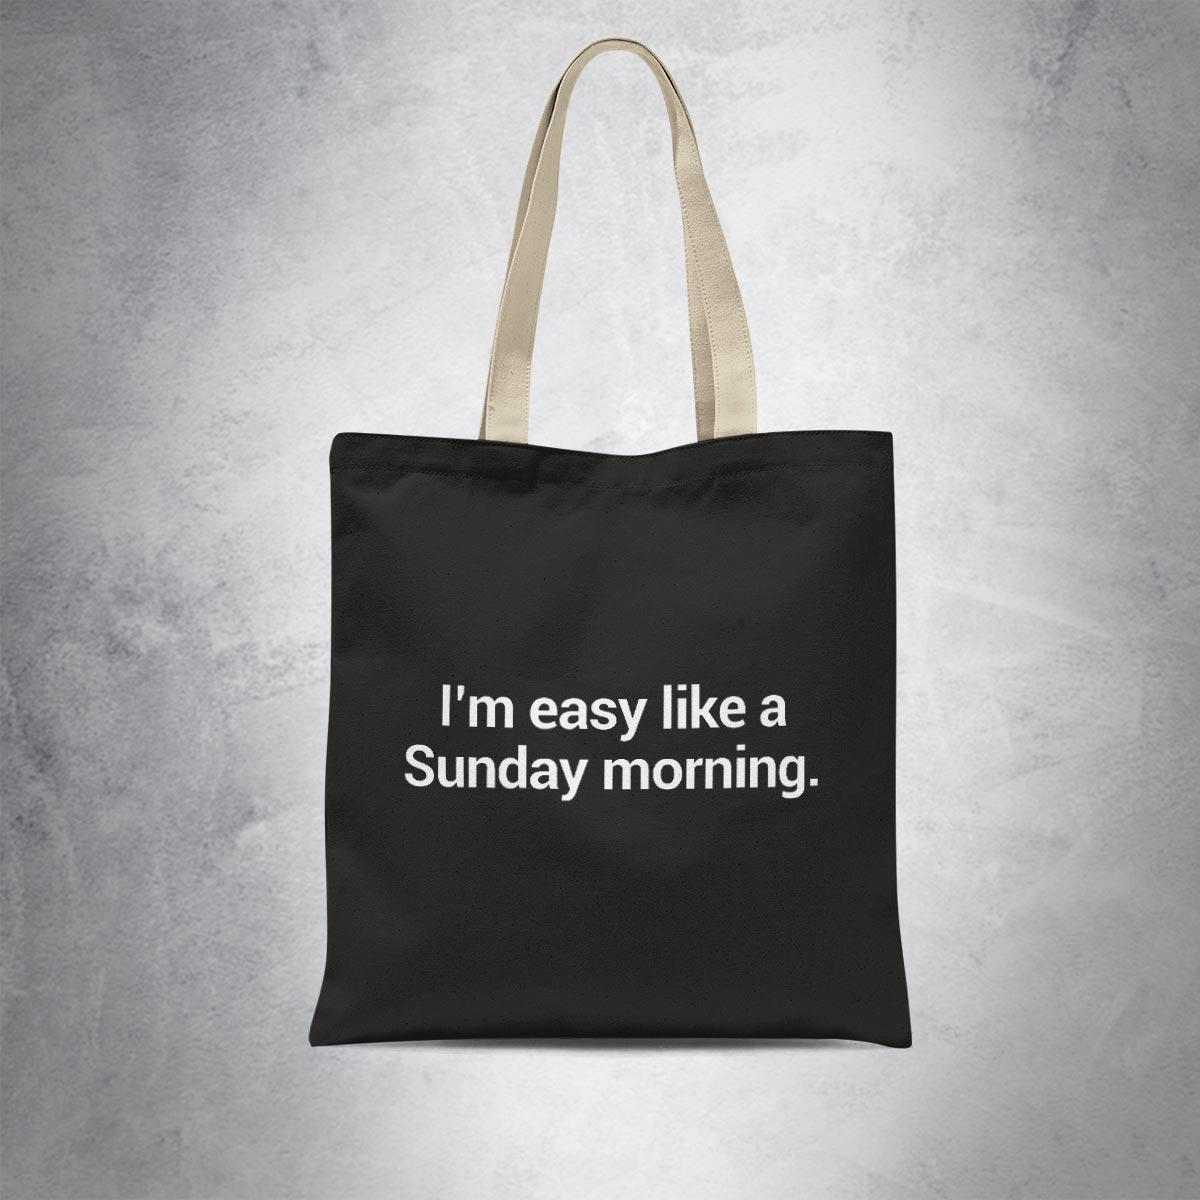 FAITH NO MORE - I'm easy like a Sunday morning